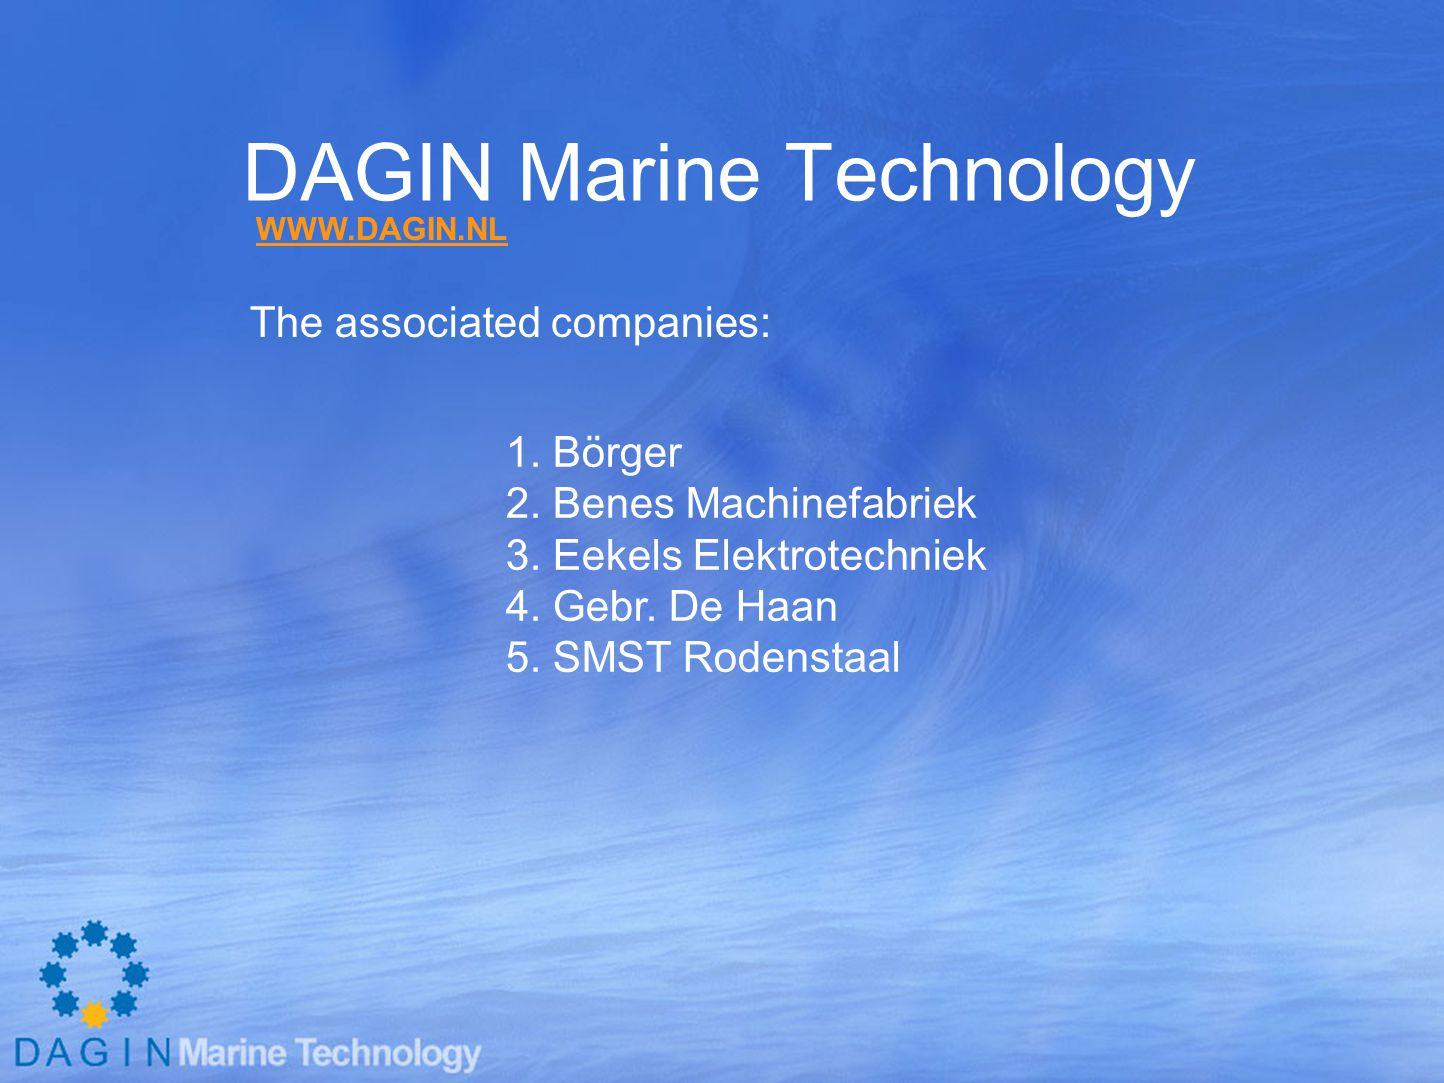 DAGIN Marine Technology In 2008: >600 employees Turnover : >100 mill. Euro WWW.DAGIN.NL